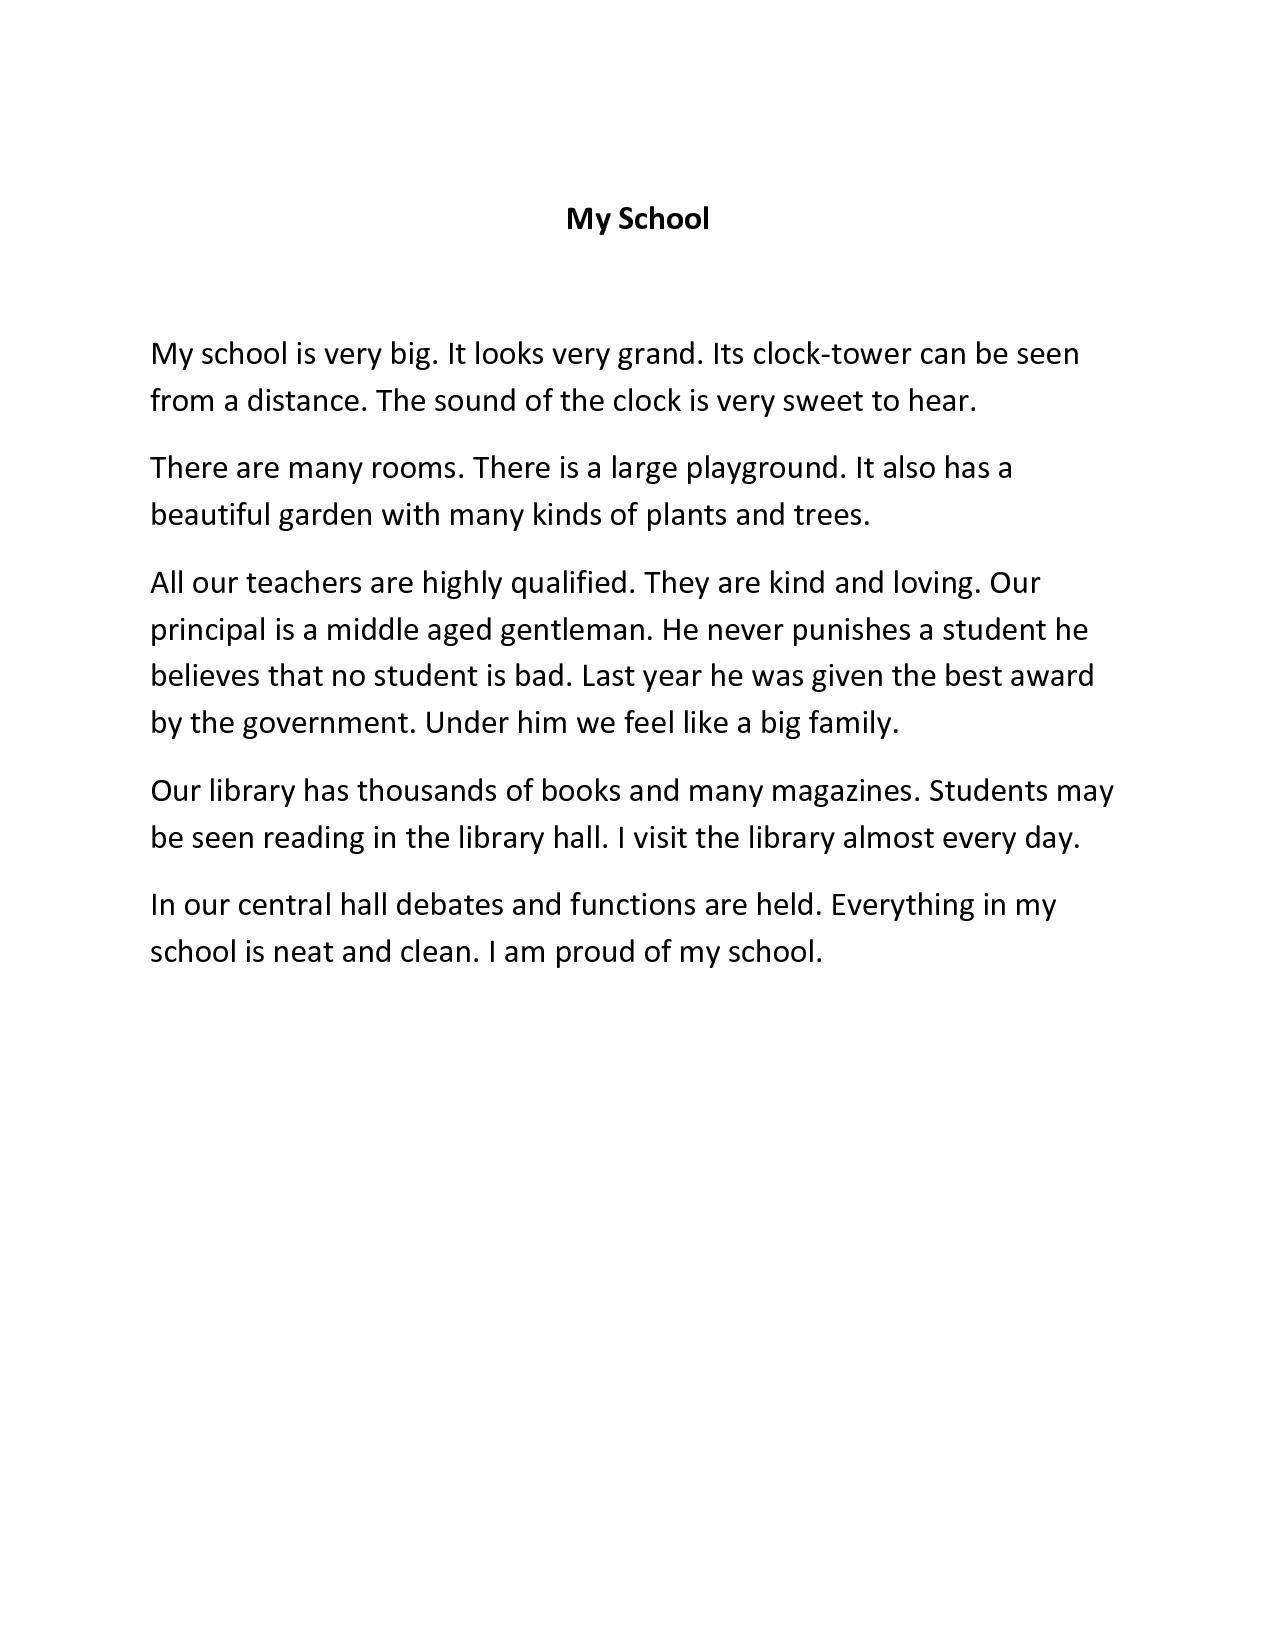 002 Essay Example My School Amazing Dream For Class 10 In Urdu 1 3 Marathi Full